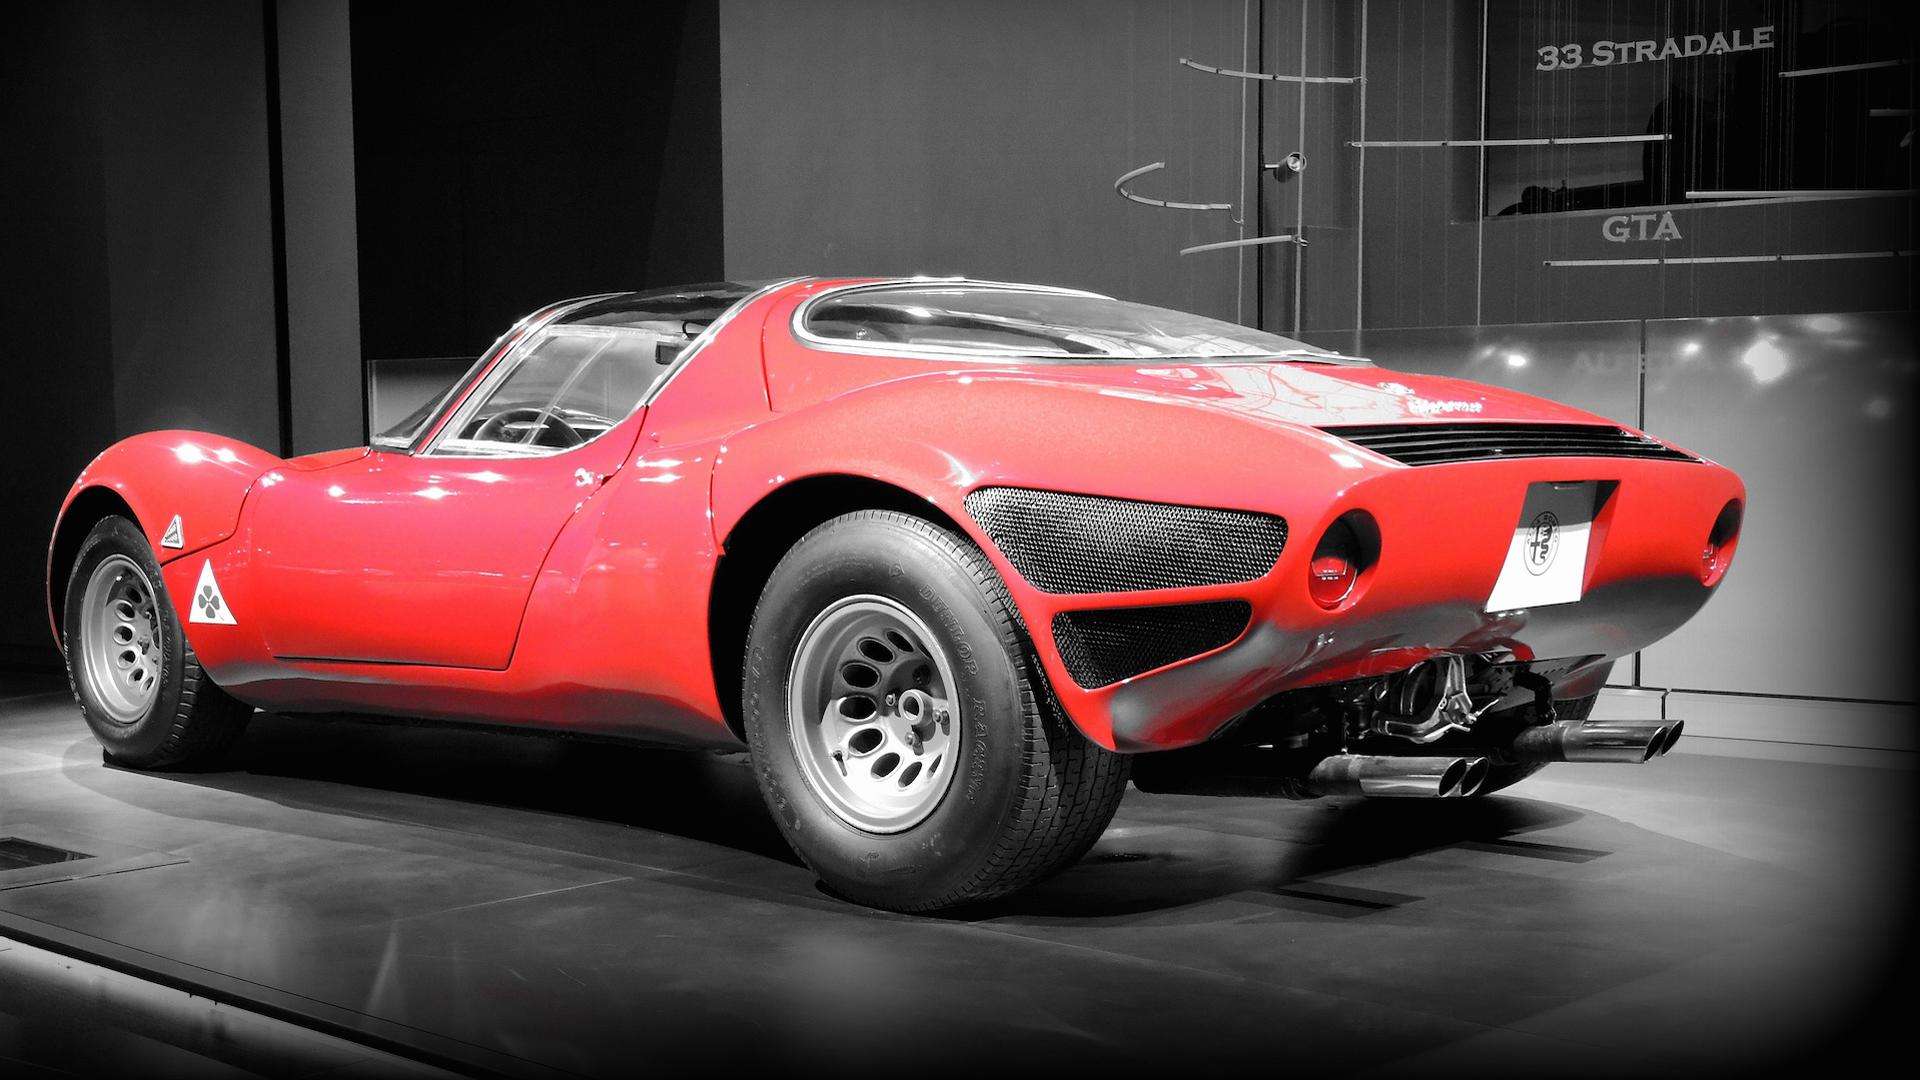 Rare Alfa Romeo Tipo 33 Stradale Sounds Great Looks Even Better